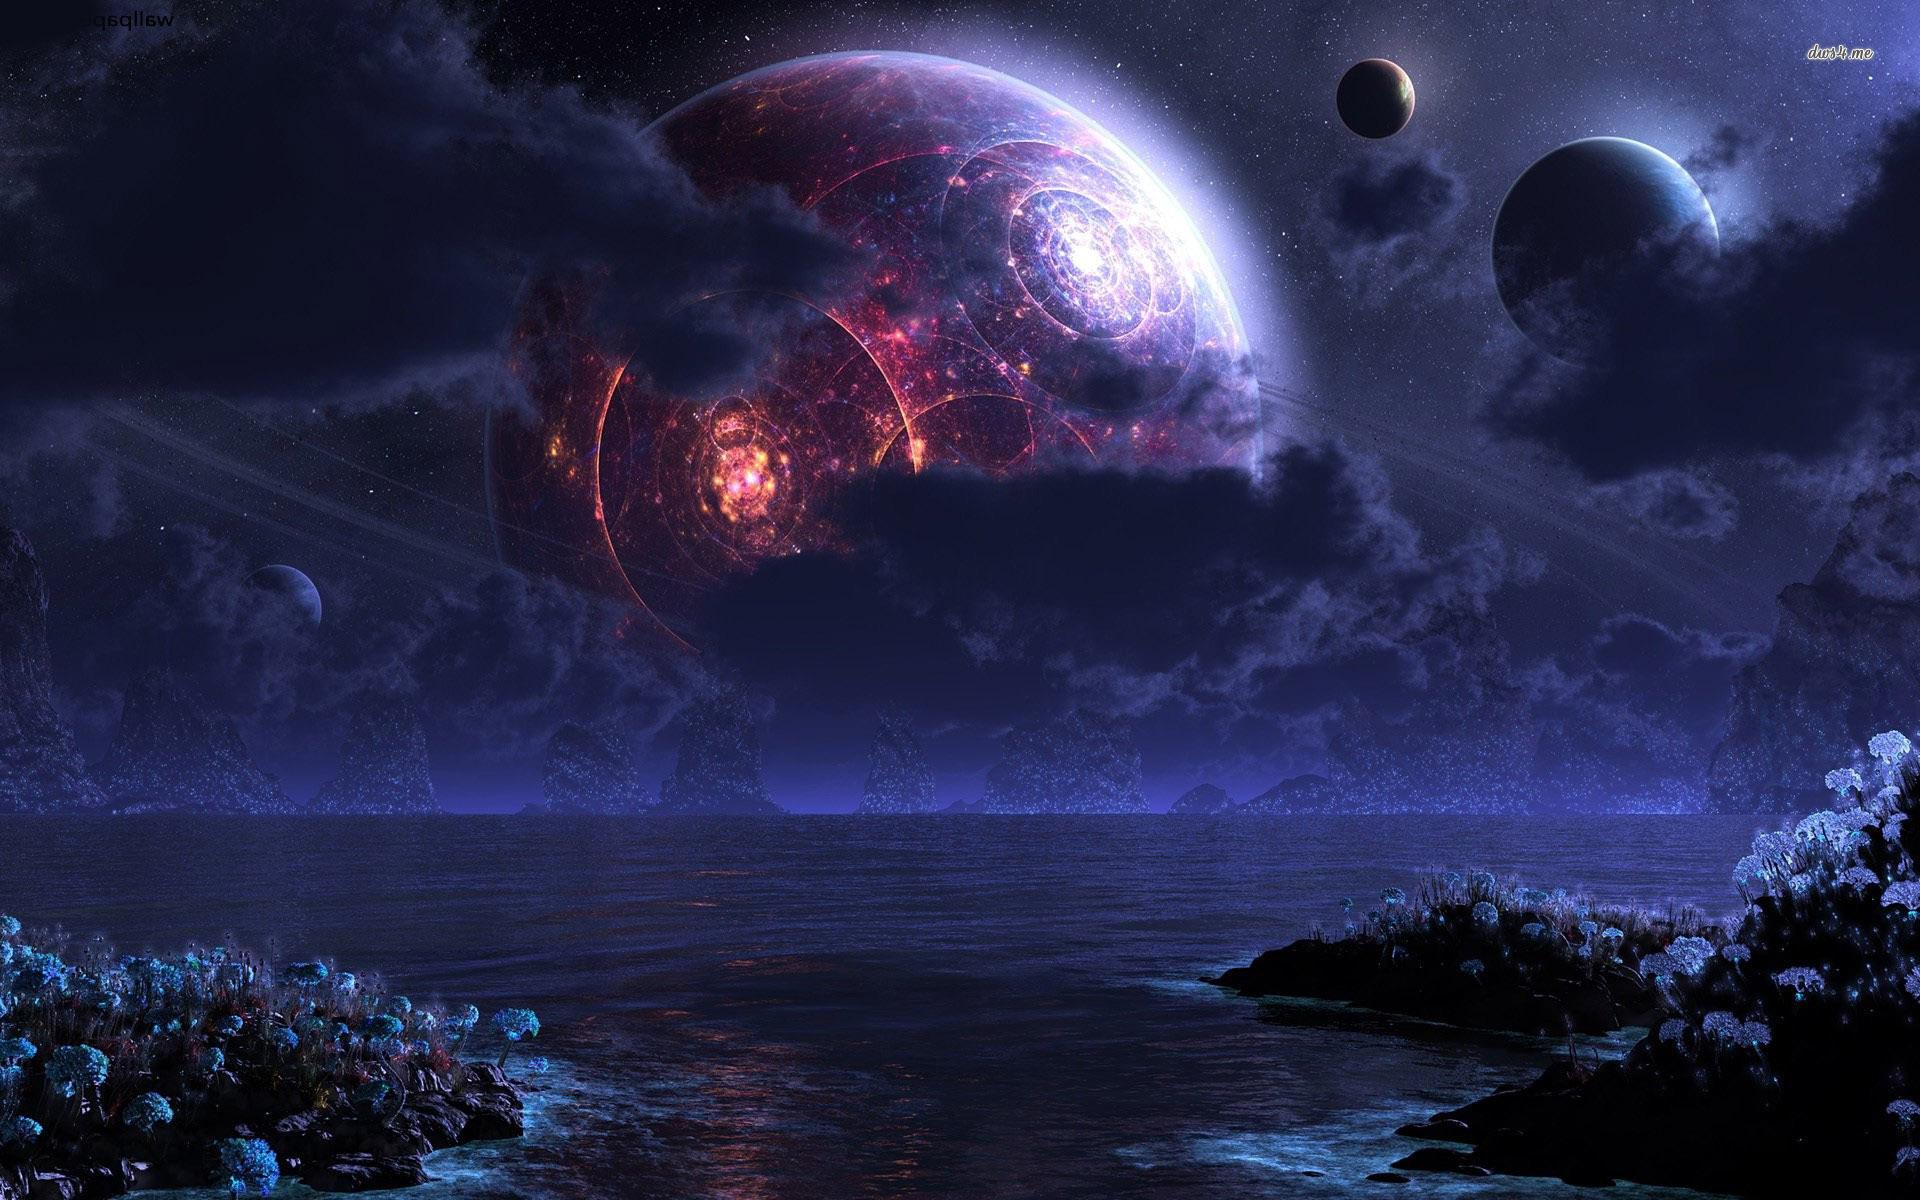 Strange planet wallpaper   Fantasy wallpapers   13854 1920x1200